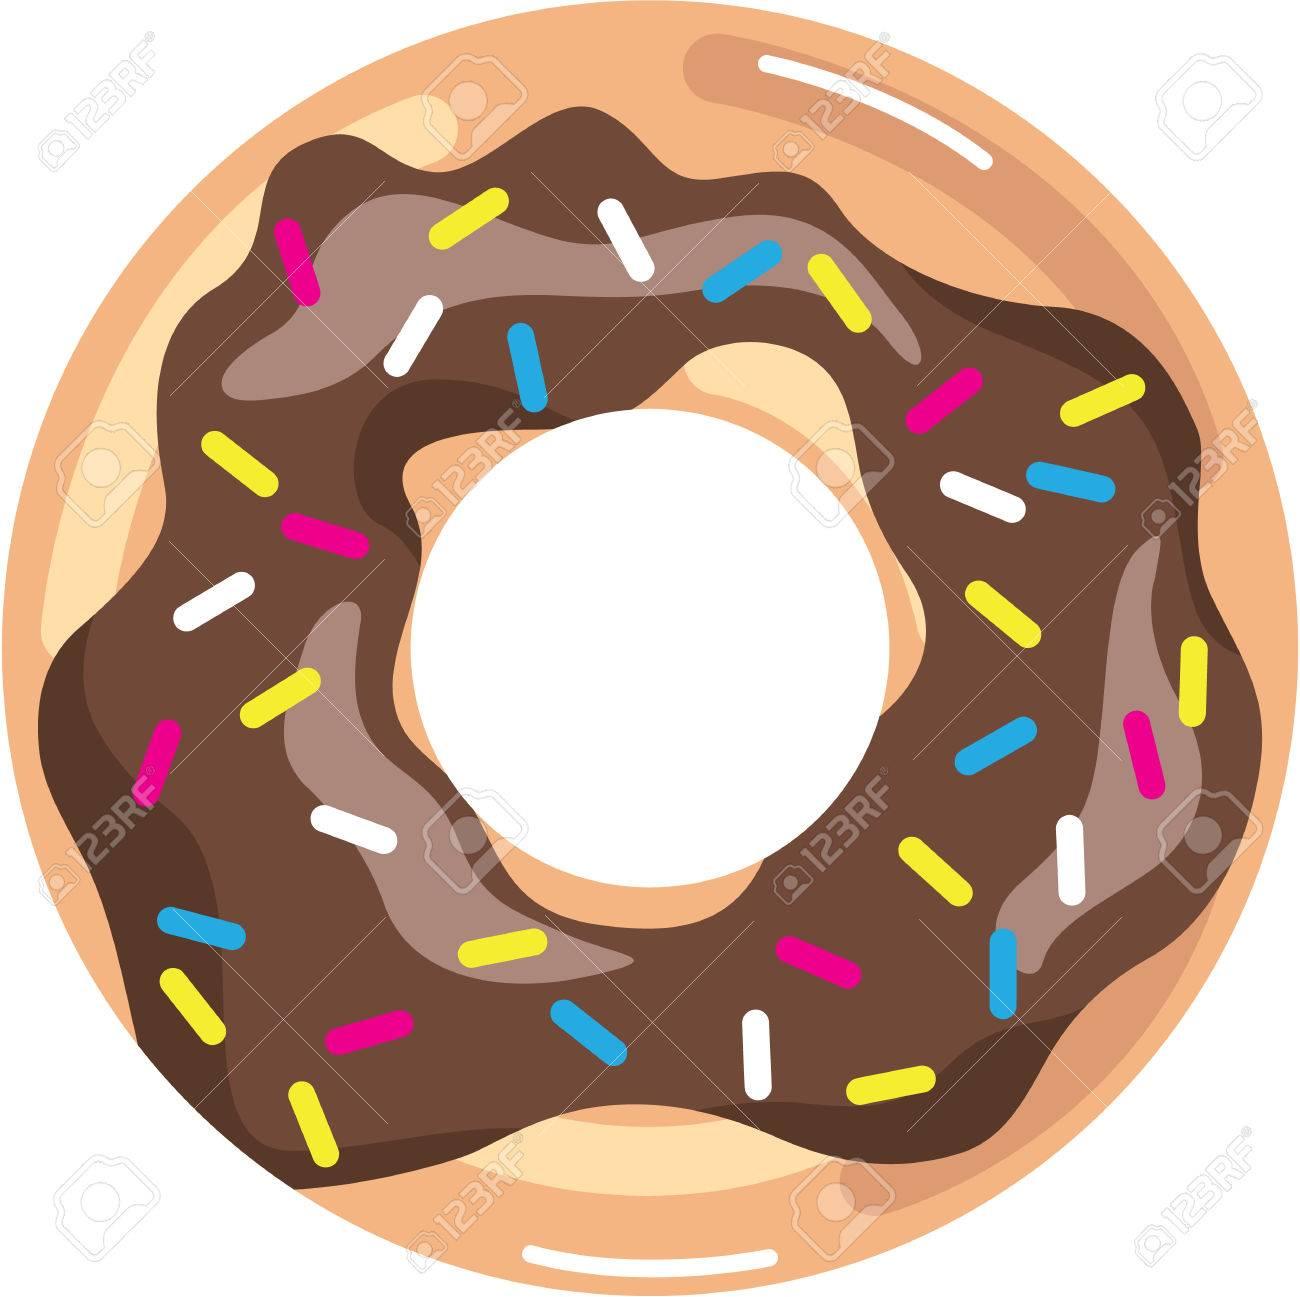 Chocolate Glazed Donut illustration clip.